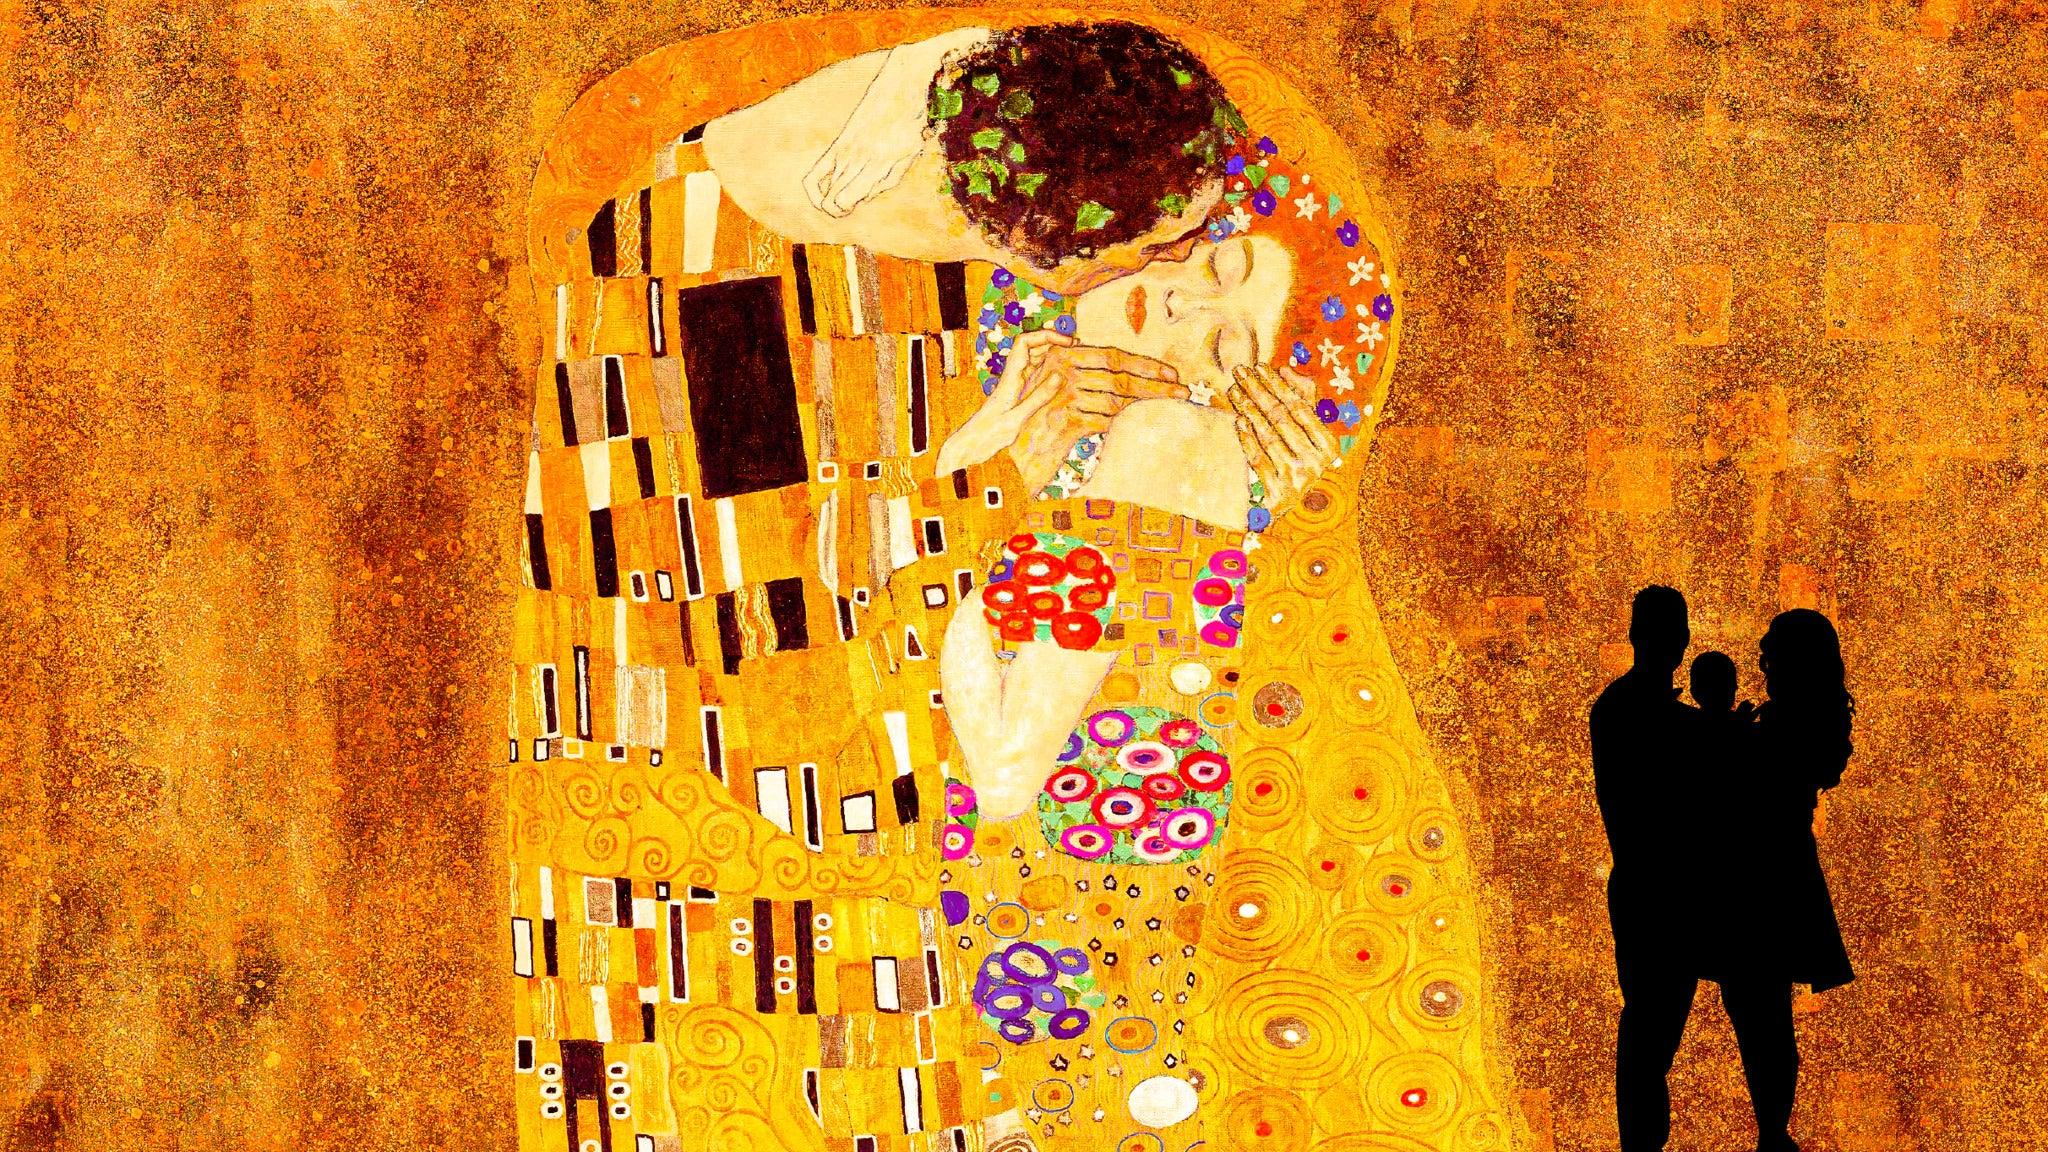 Klimt, The Immersive Experience